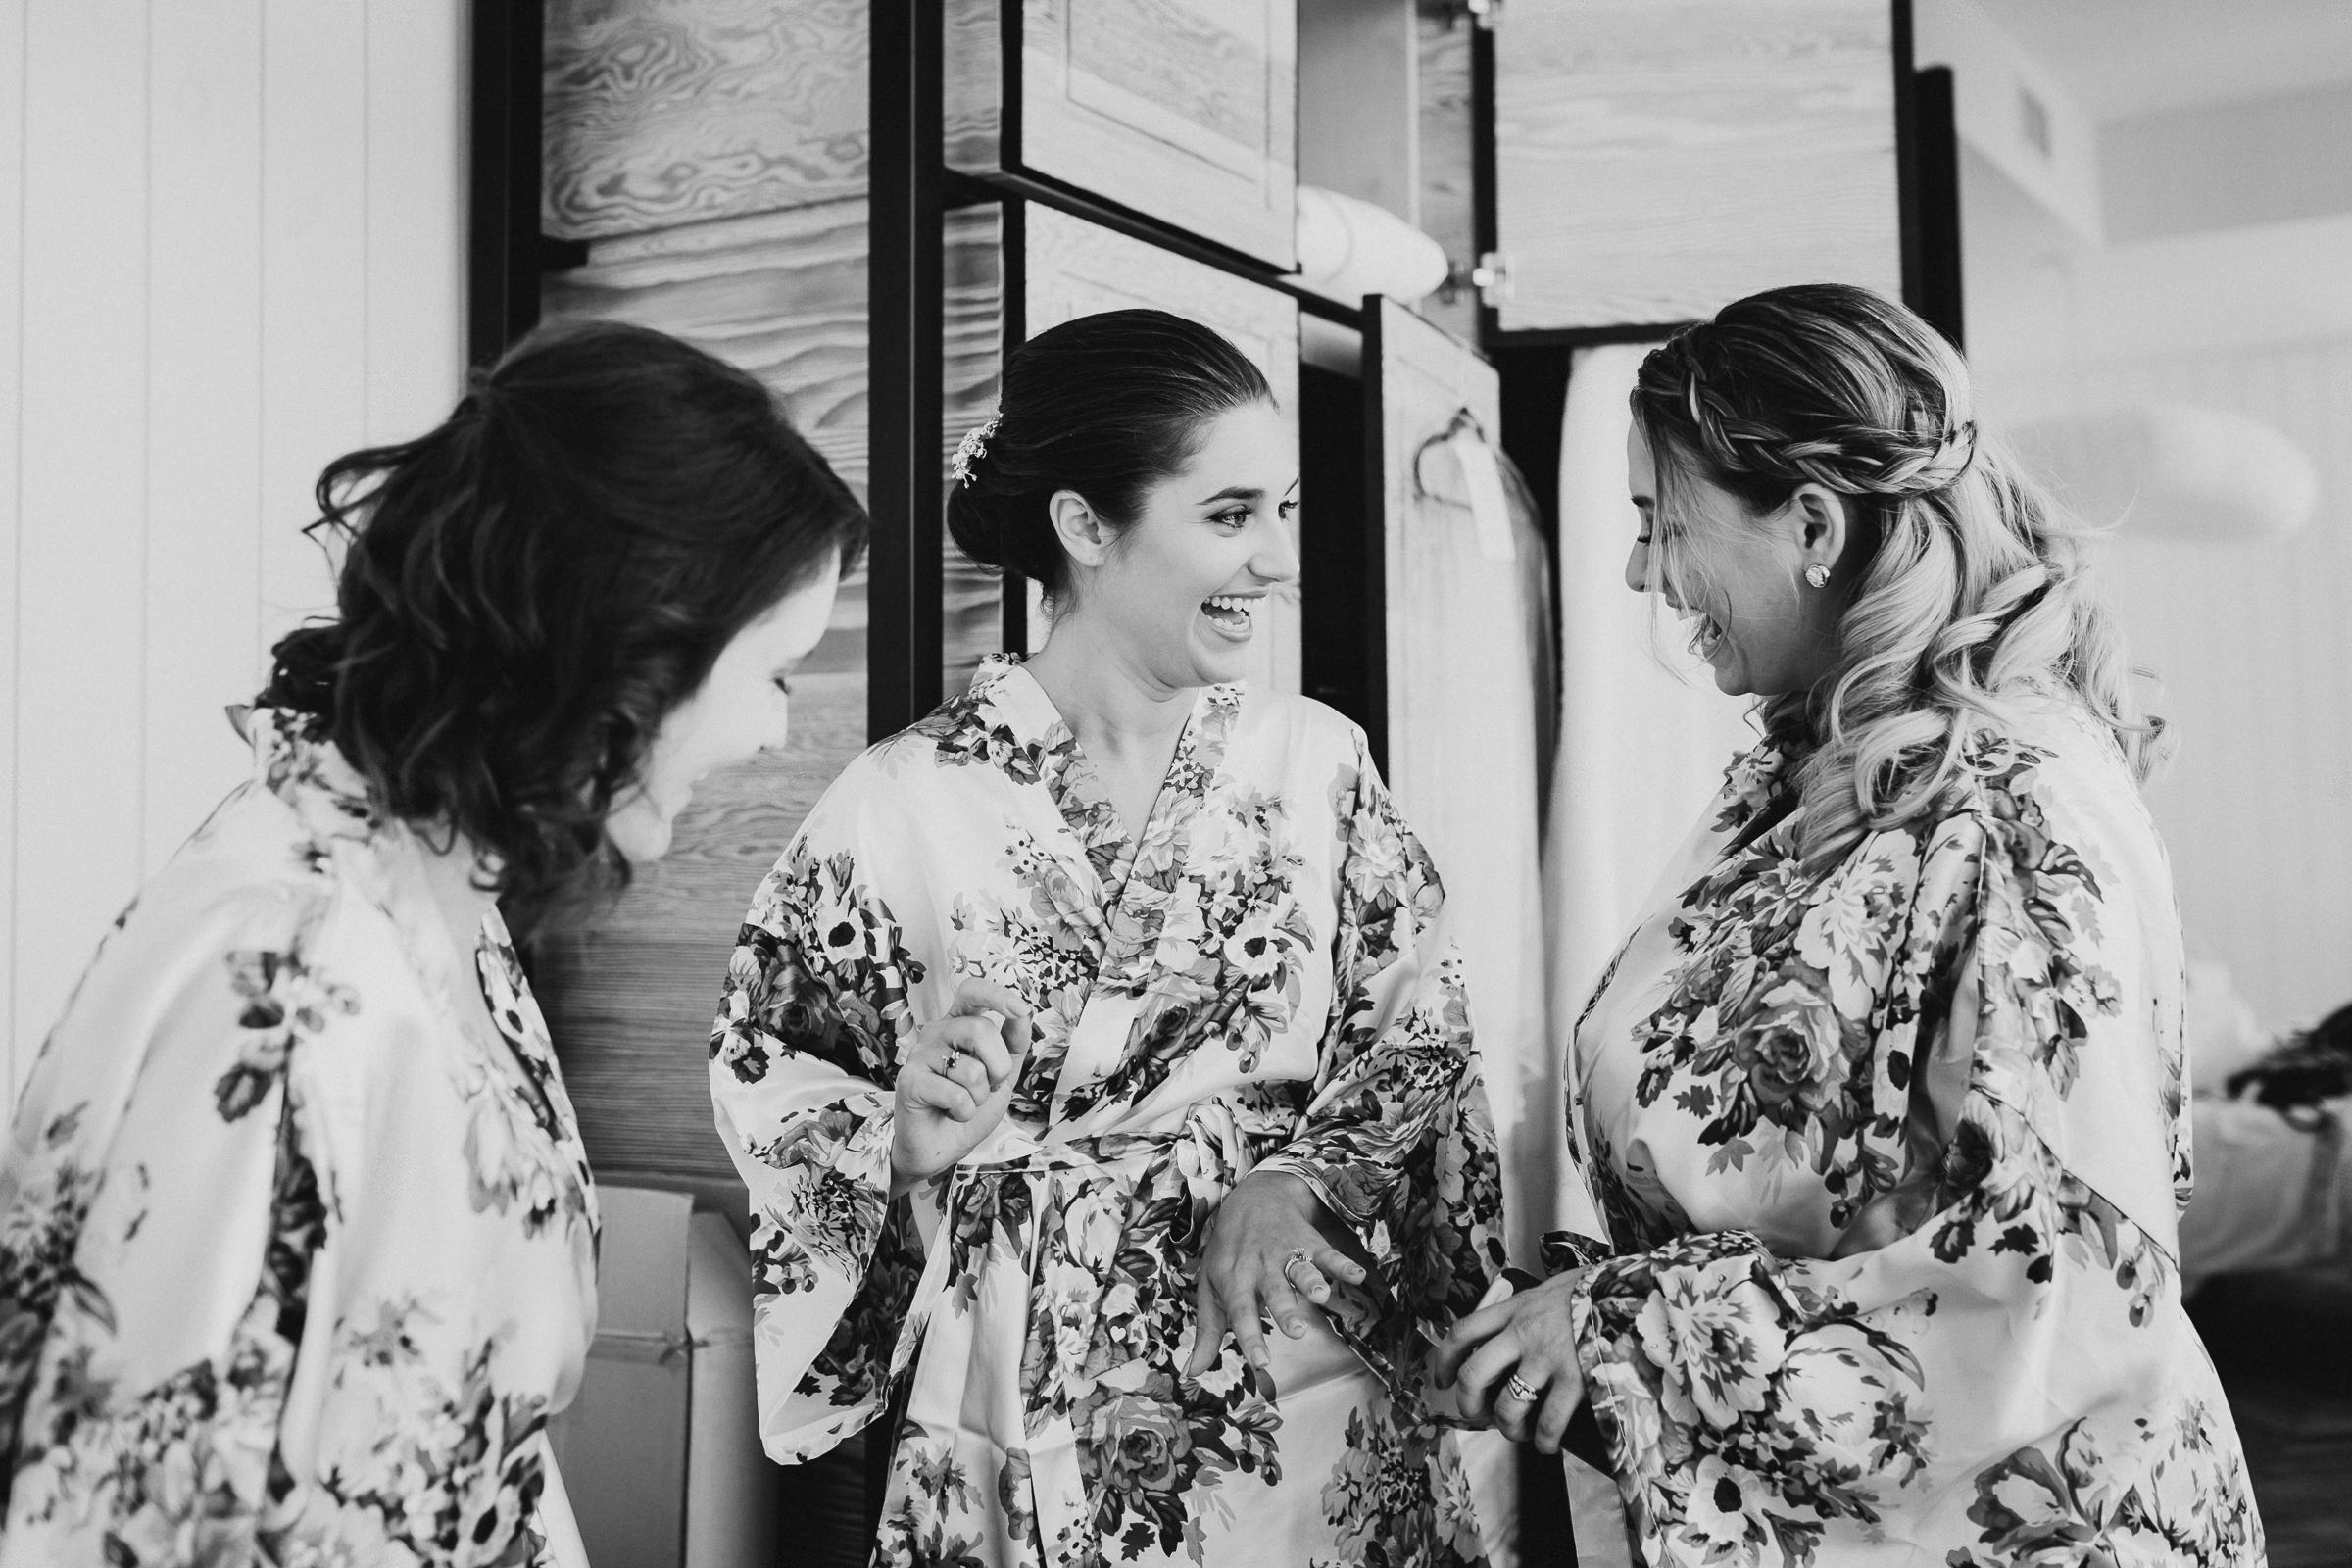 Brooklyn-Winery-NYC-Editorial-Documentary-Wedding-Photographer-Gina-Oli-3.jpg